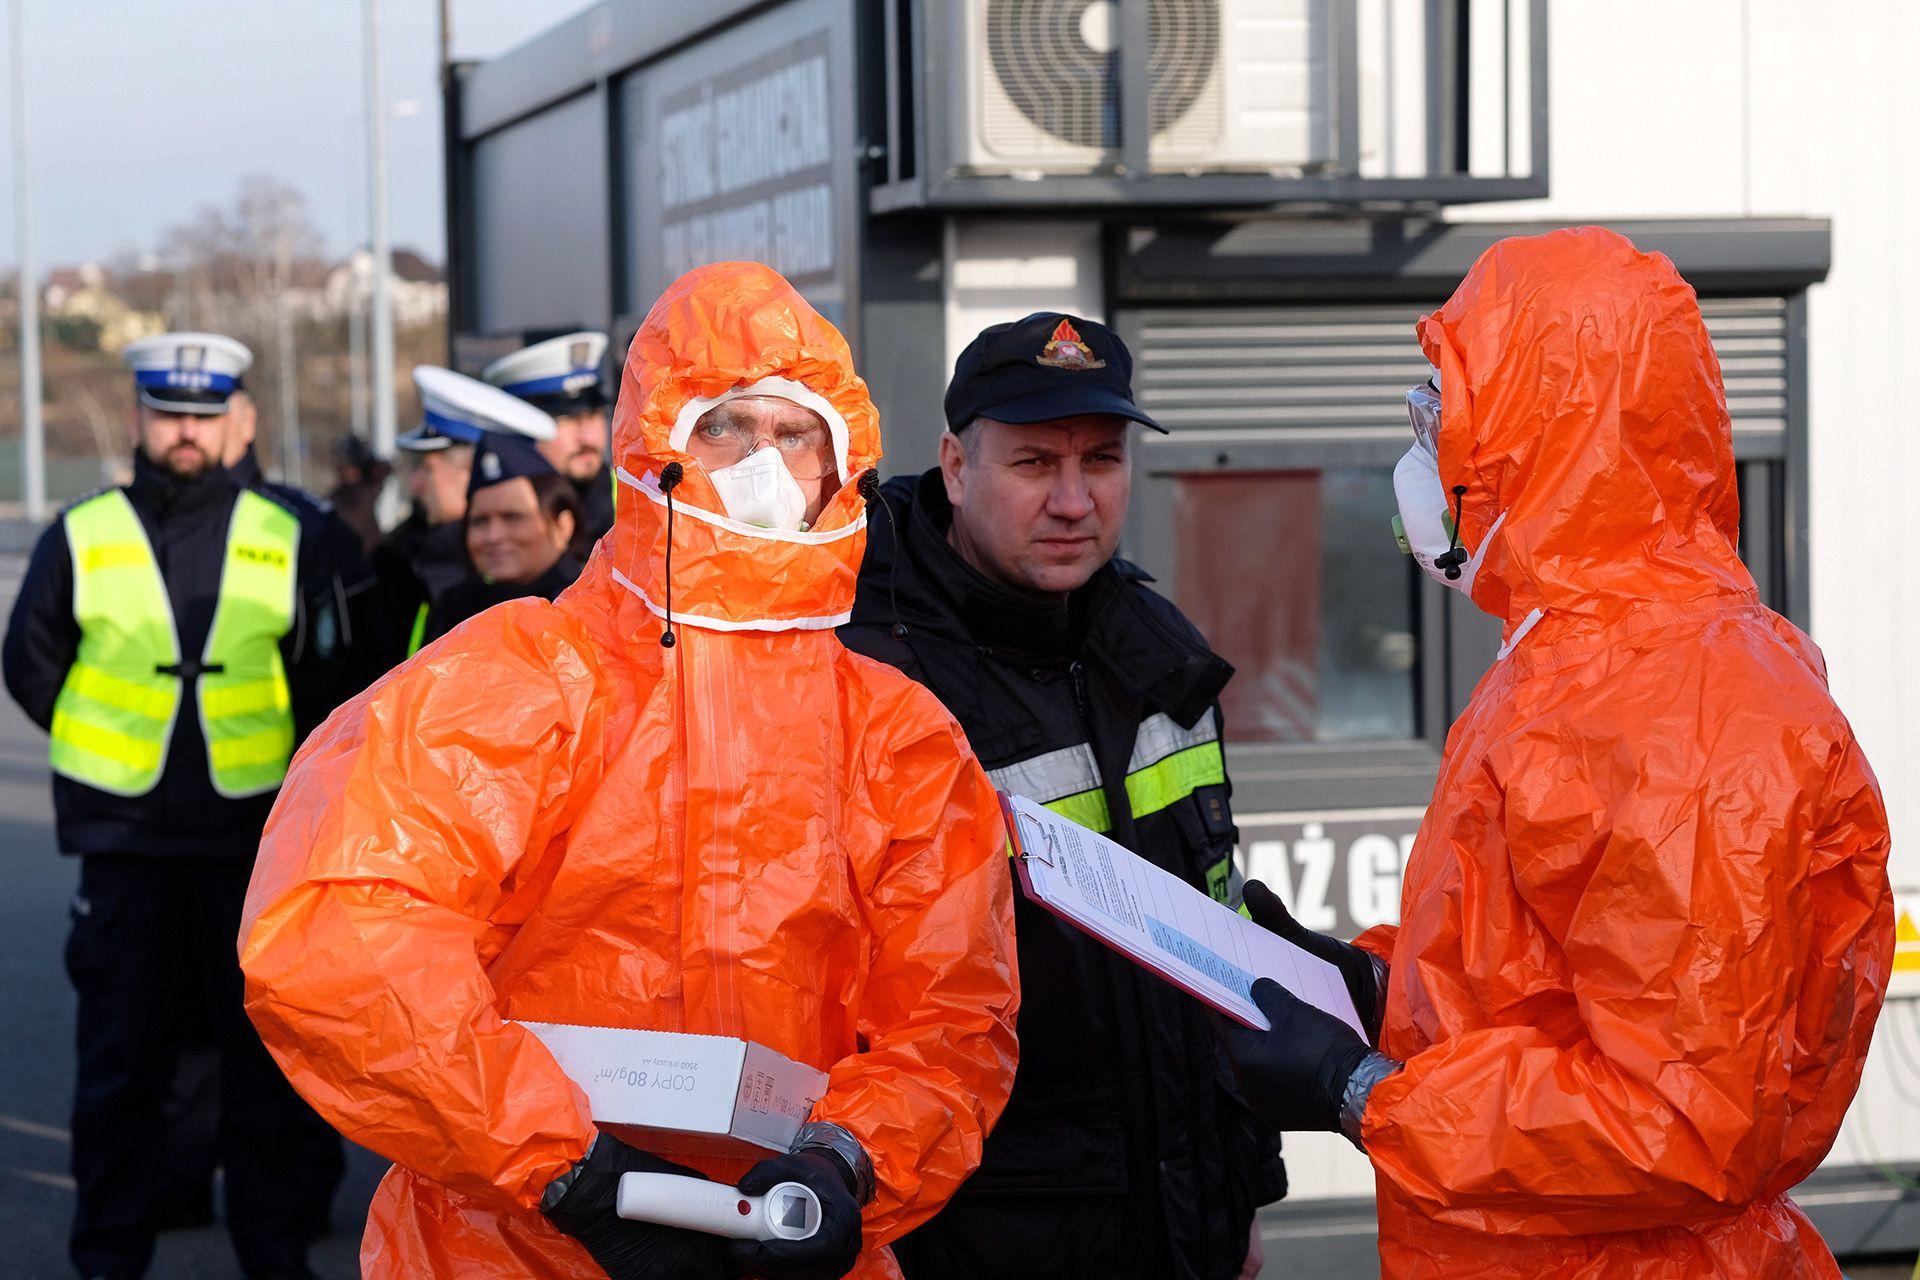 Fotó: MTI/EPA/PAP/Andrzej Grygiel